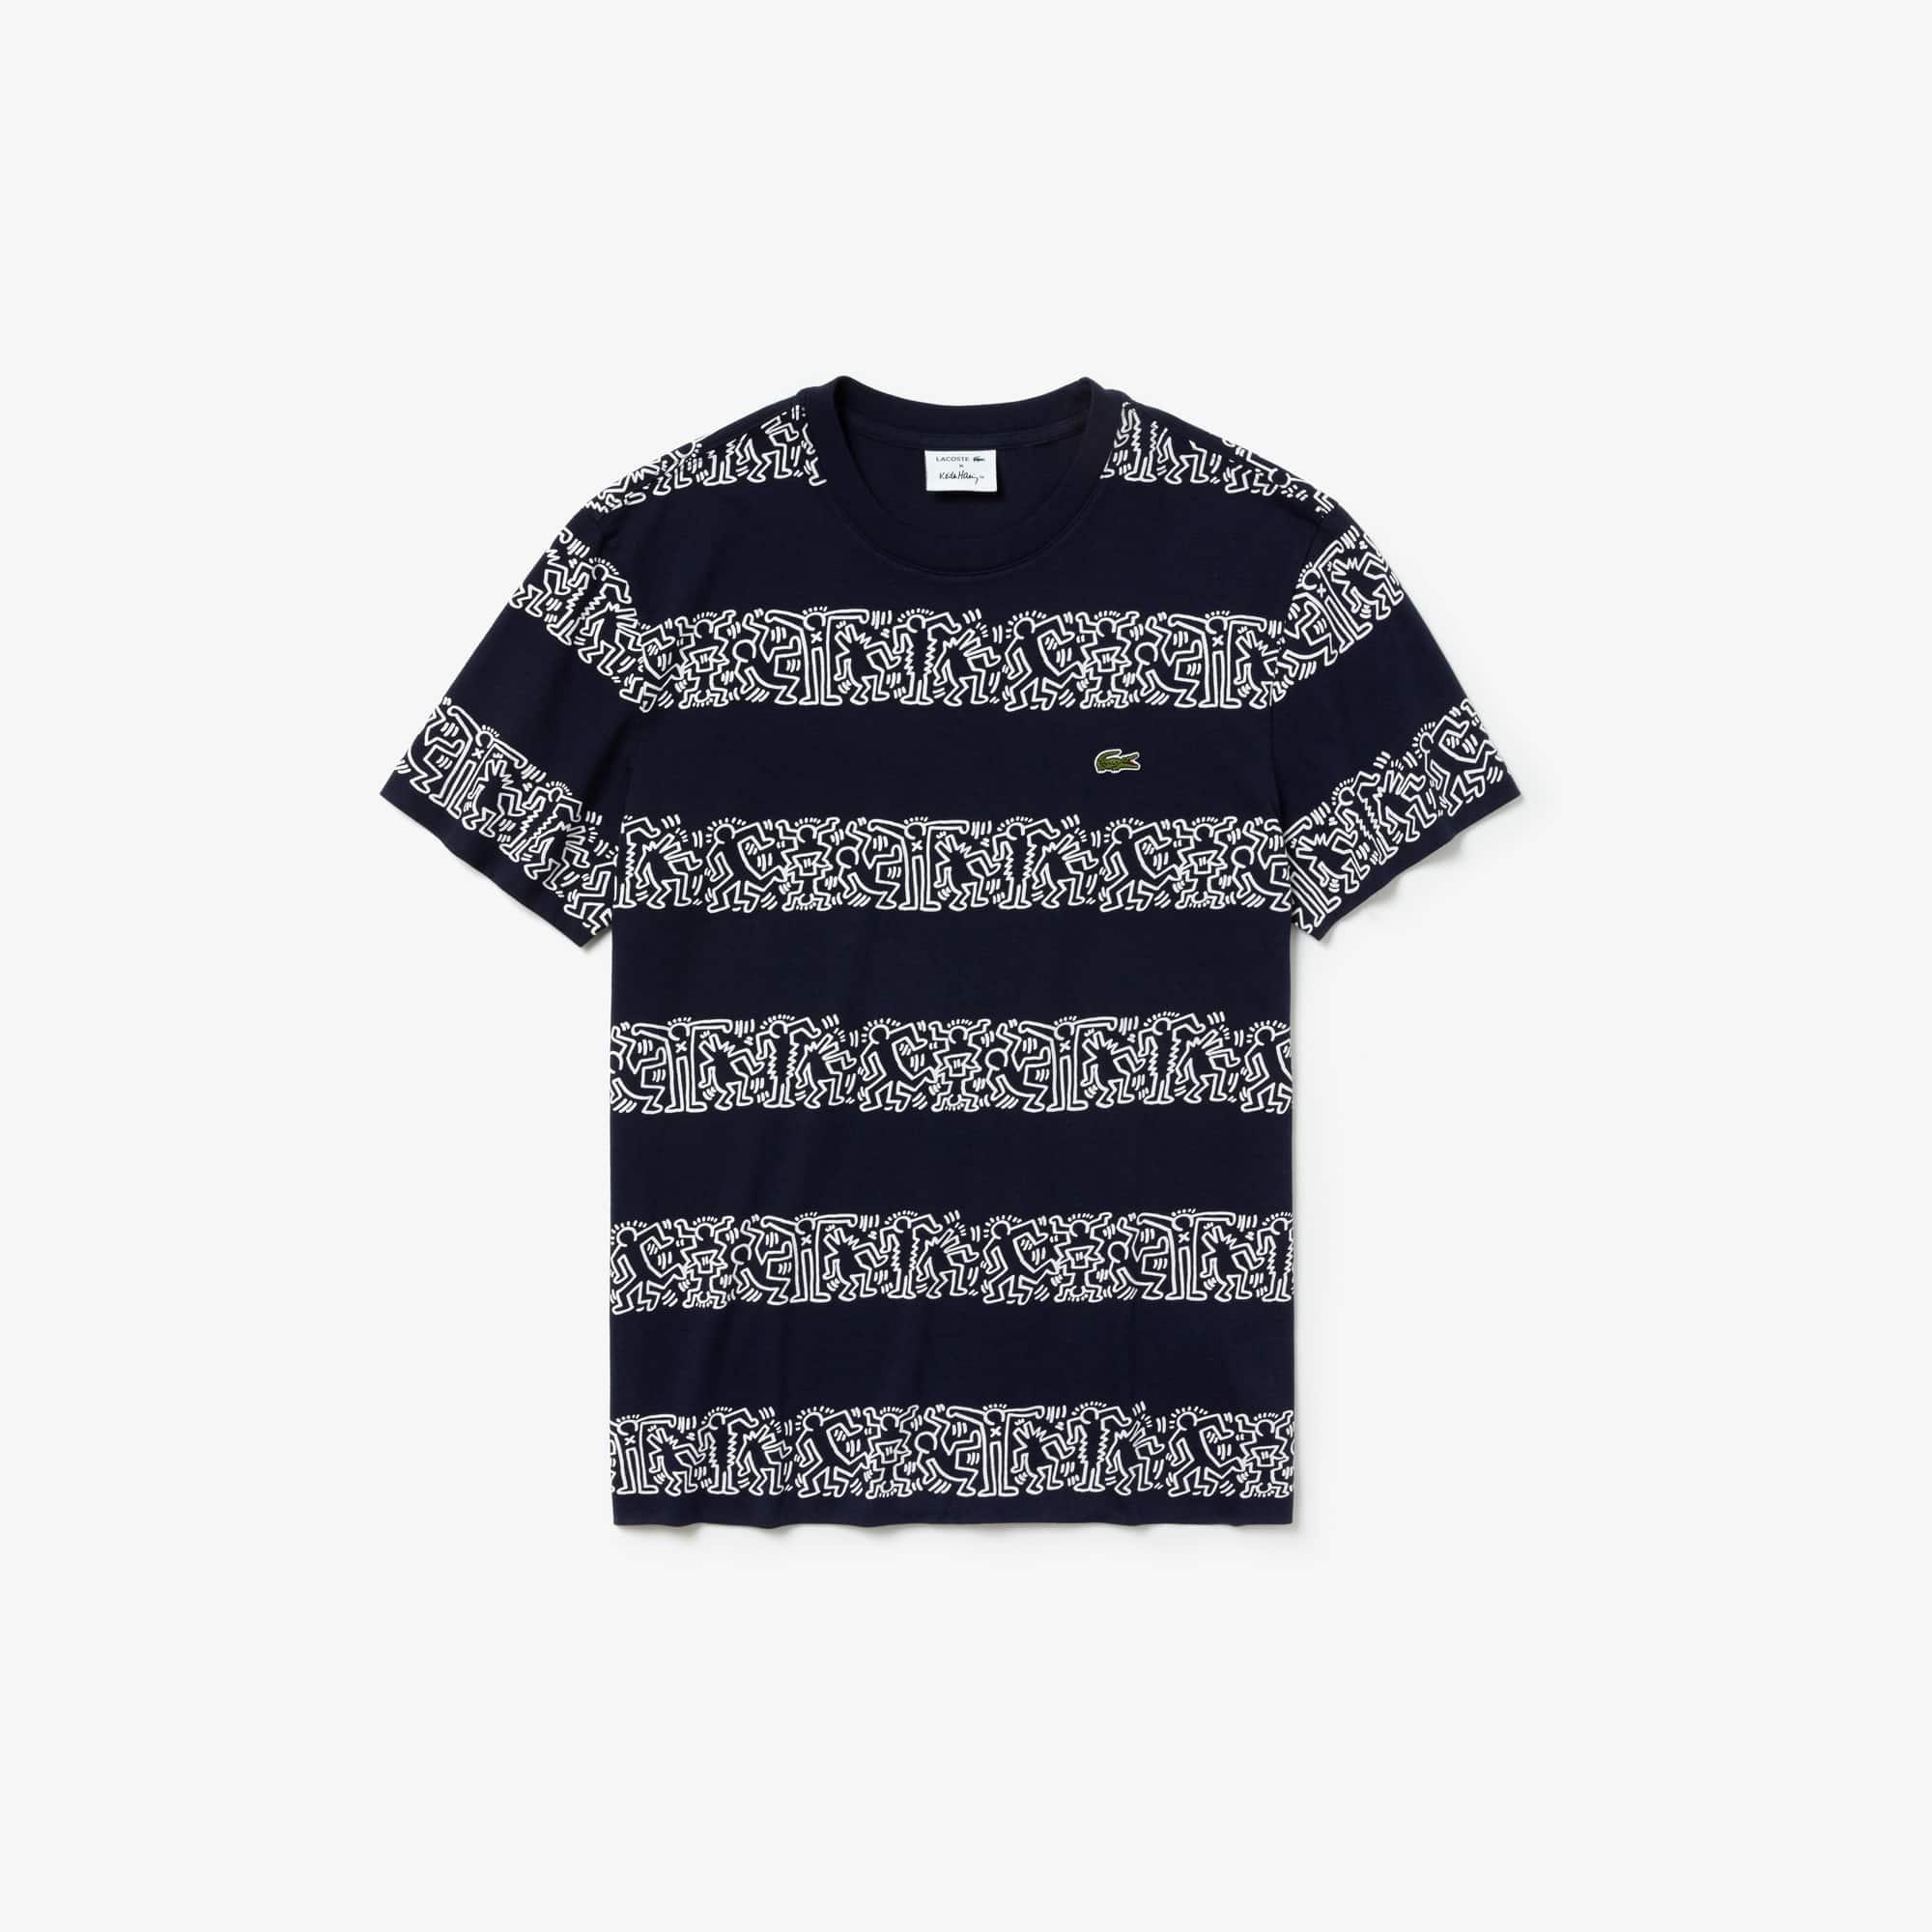 b9dfde48 Men's Keith Haring Striped Print Crew Neck Cotton T-shirt | LACOSTE